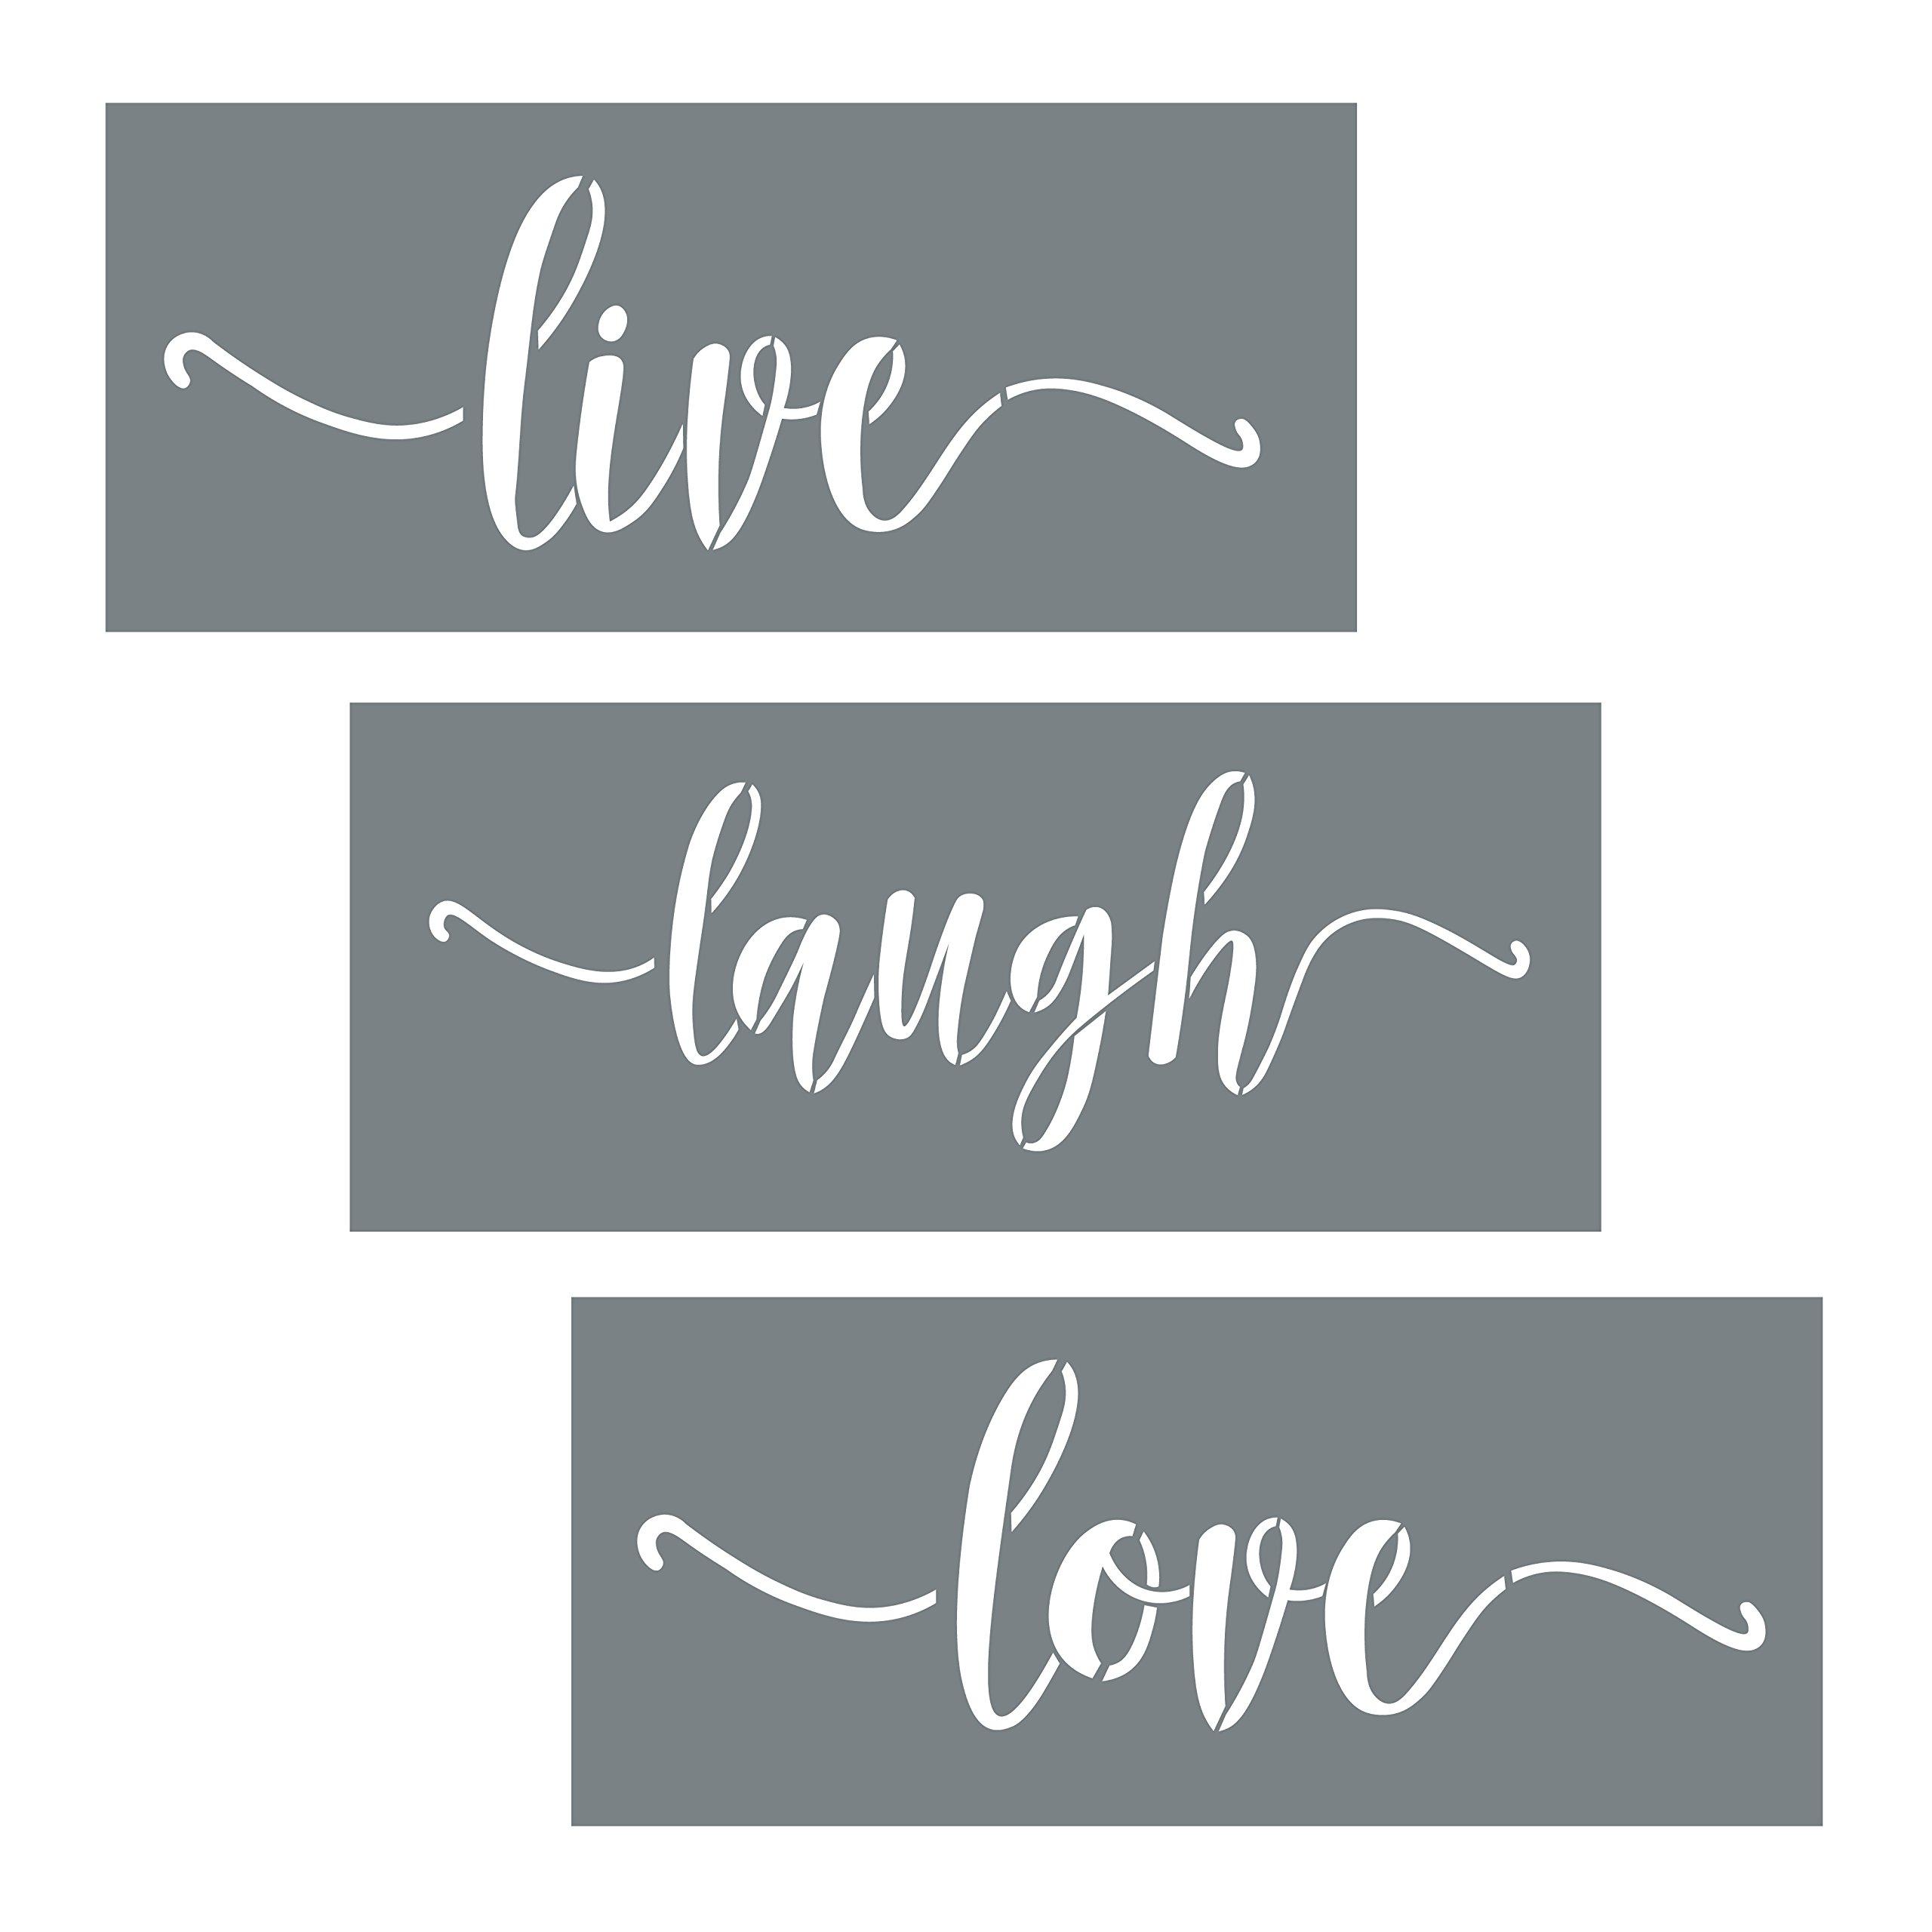 Live, Laugh, Love Quote Stencils - 3 Reusable Script Stencils - Wall Stencil Set for Making DIY Wall Decor